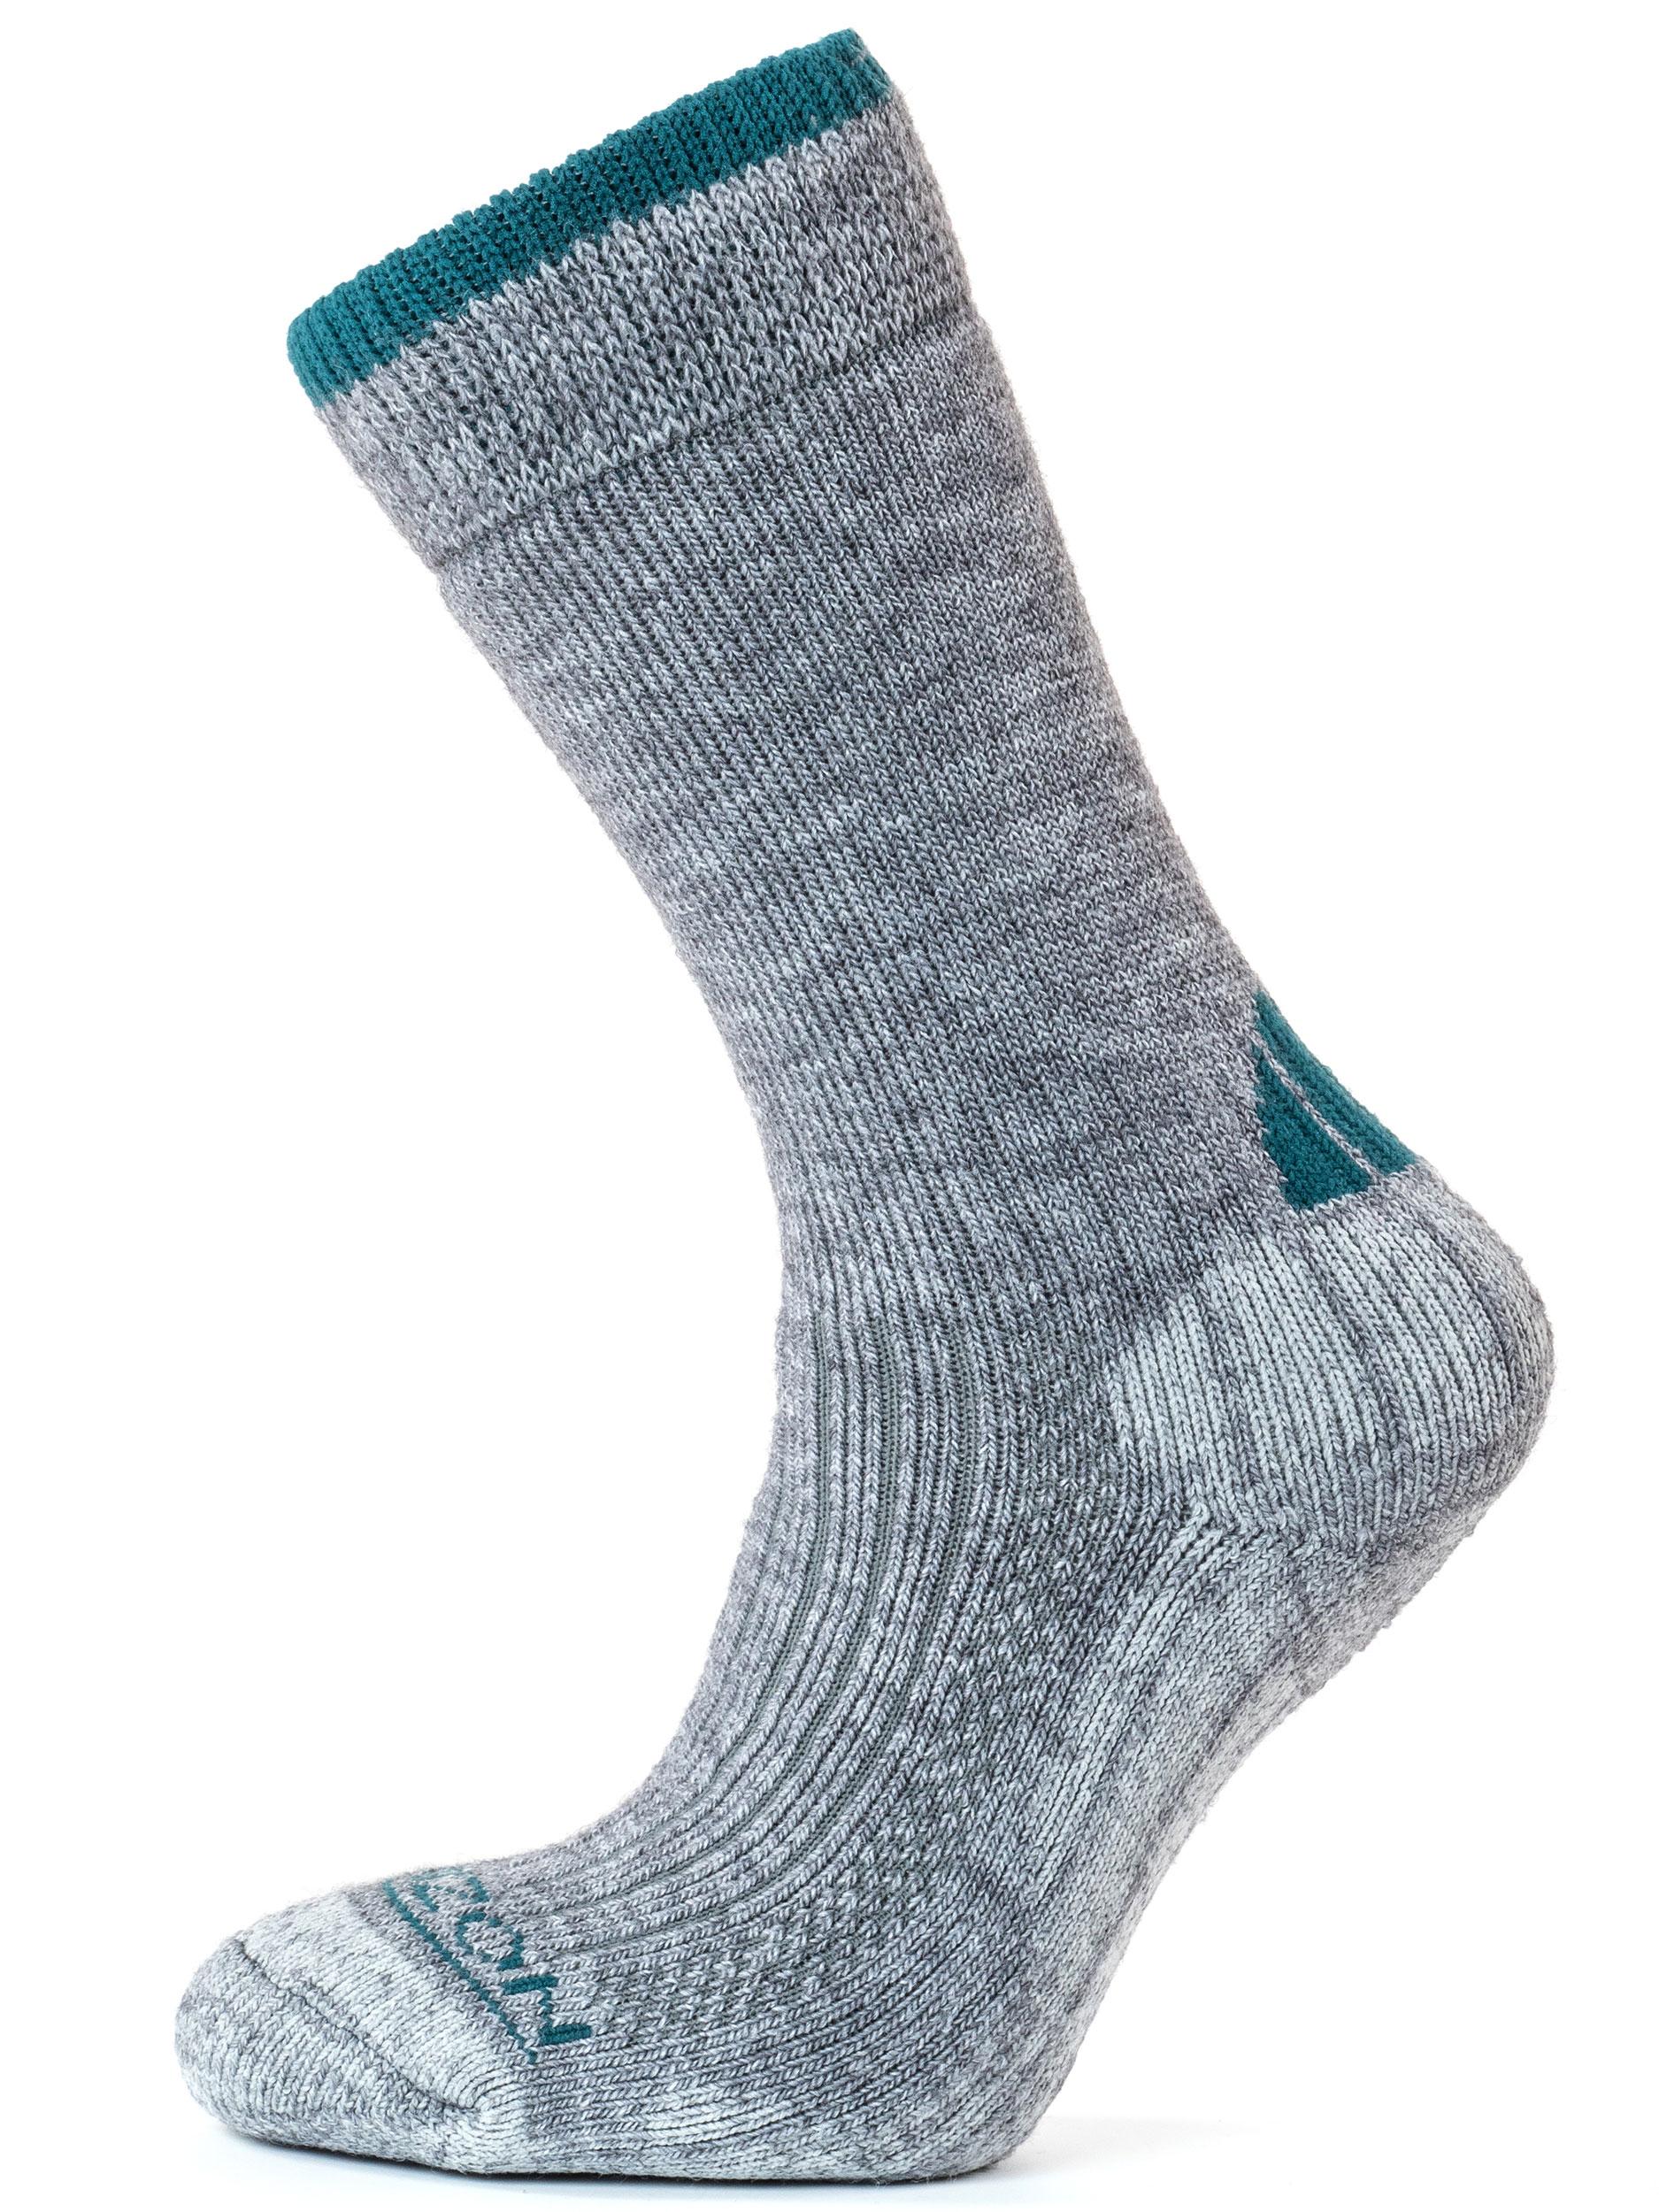 Merino-Trekker-Grey-Teal